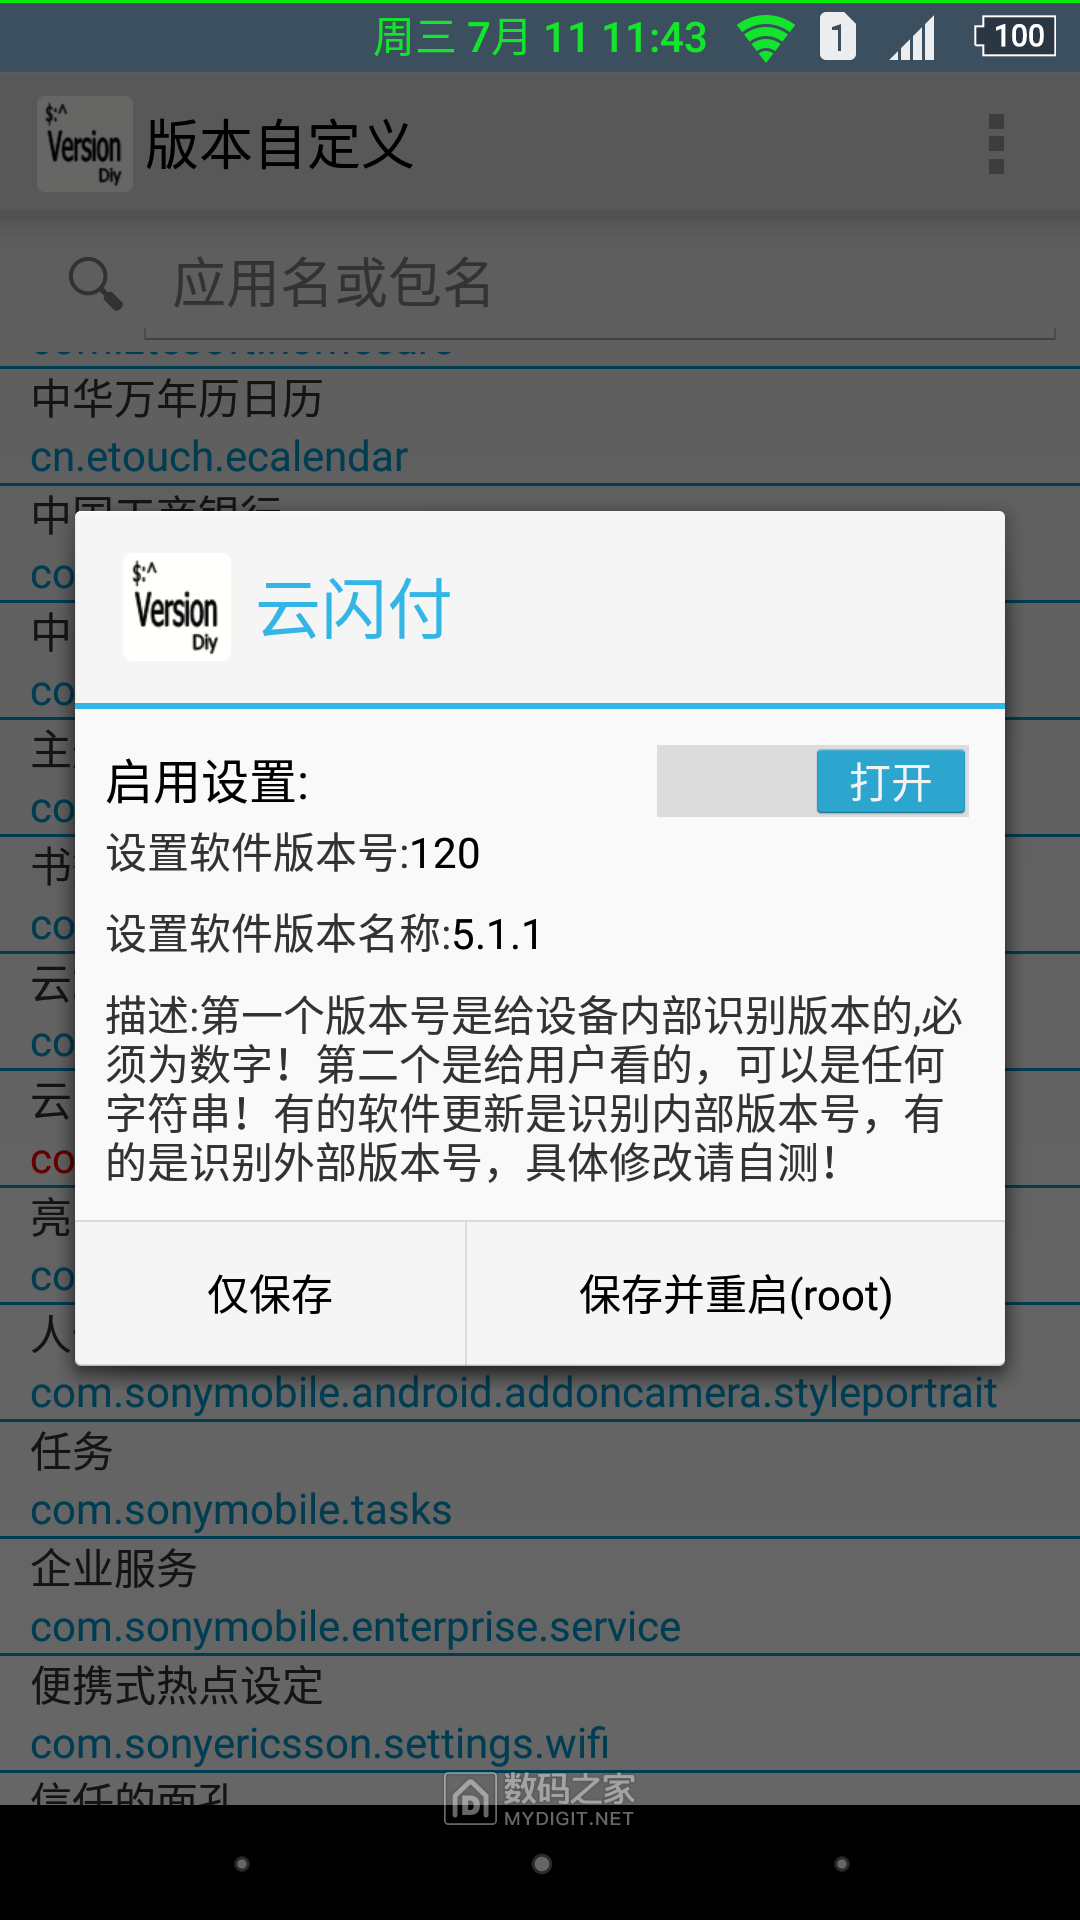 sony Z3 D6633 rooted 用工行云闪付xposed模块骗过软件root检测